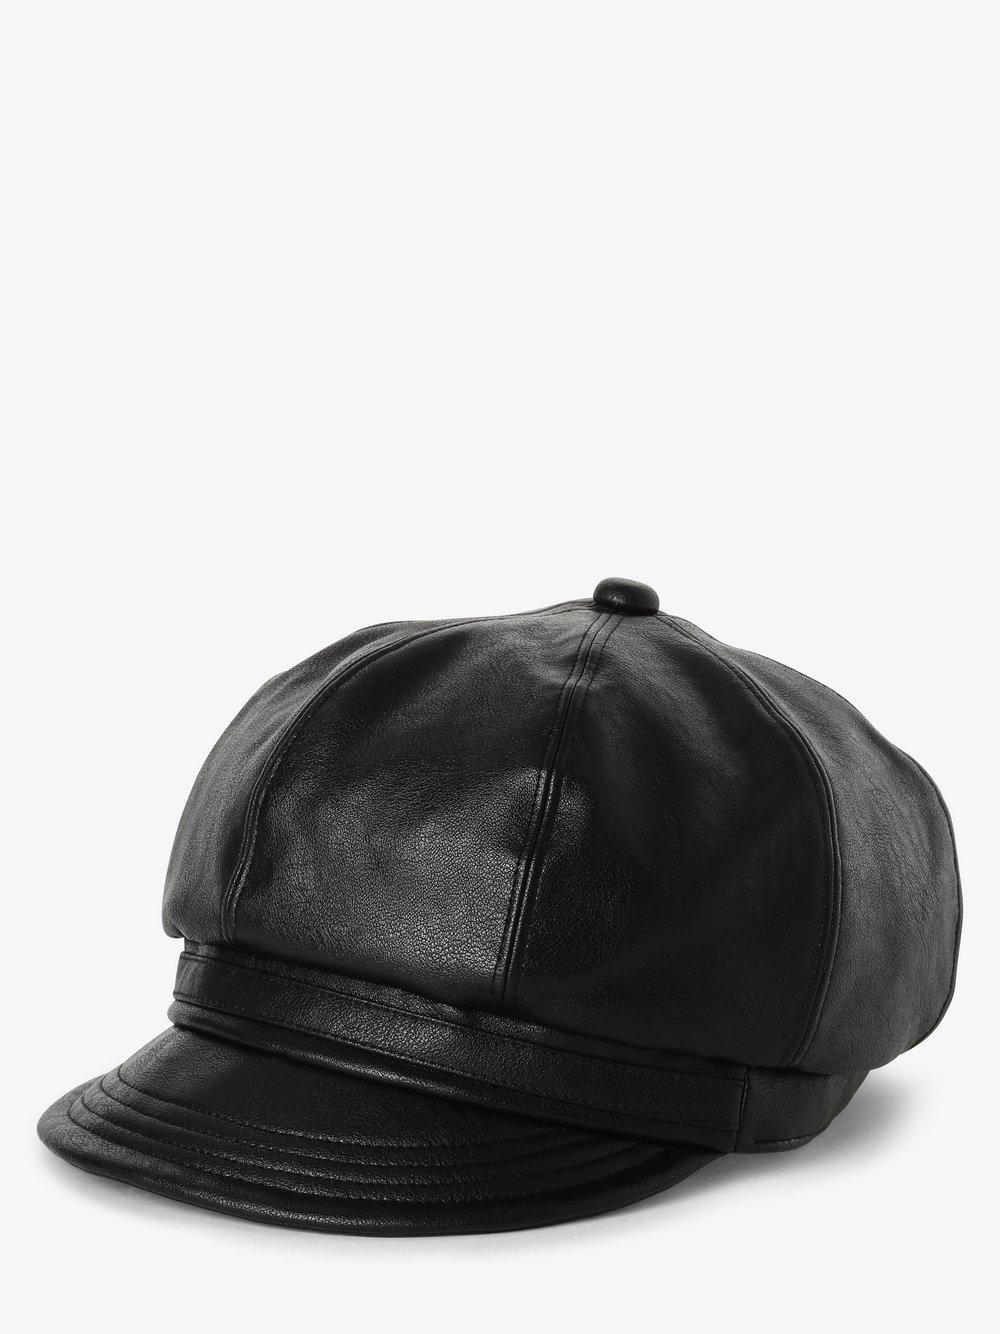 Loevenich – Czapka damska, czarny Van Graaf 486229-0001-00000